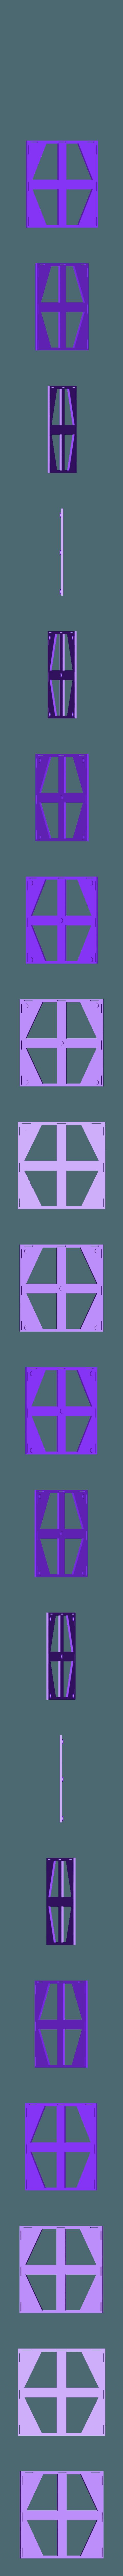 base.stl Download STL file Modular desktop organizer • 3D printing design, LnZProd